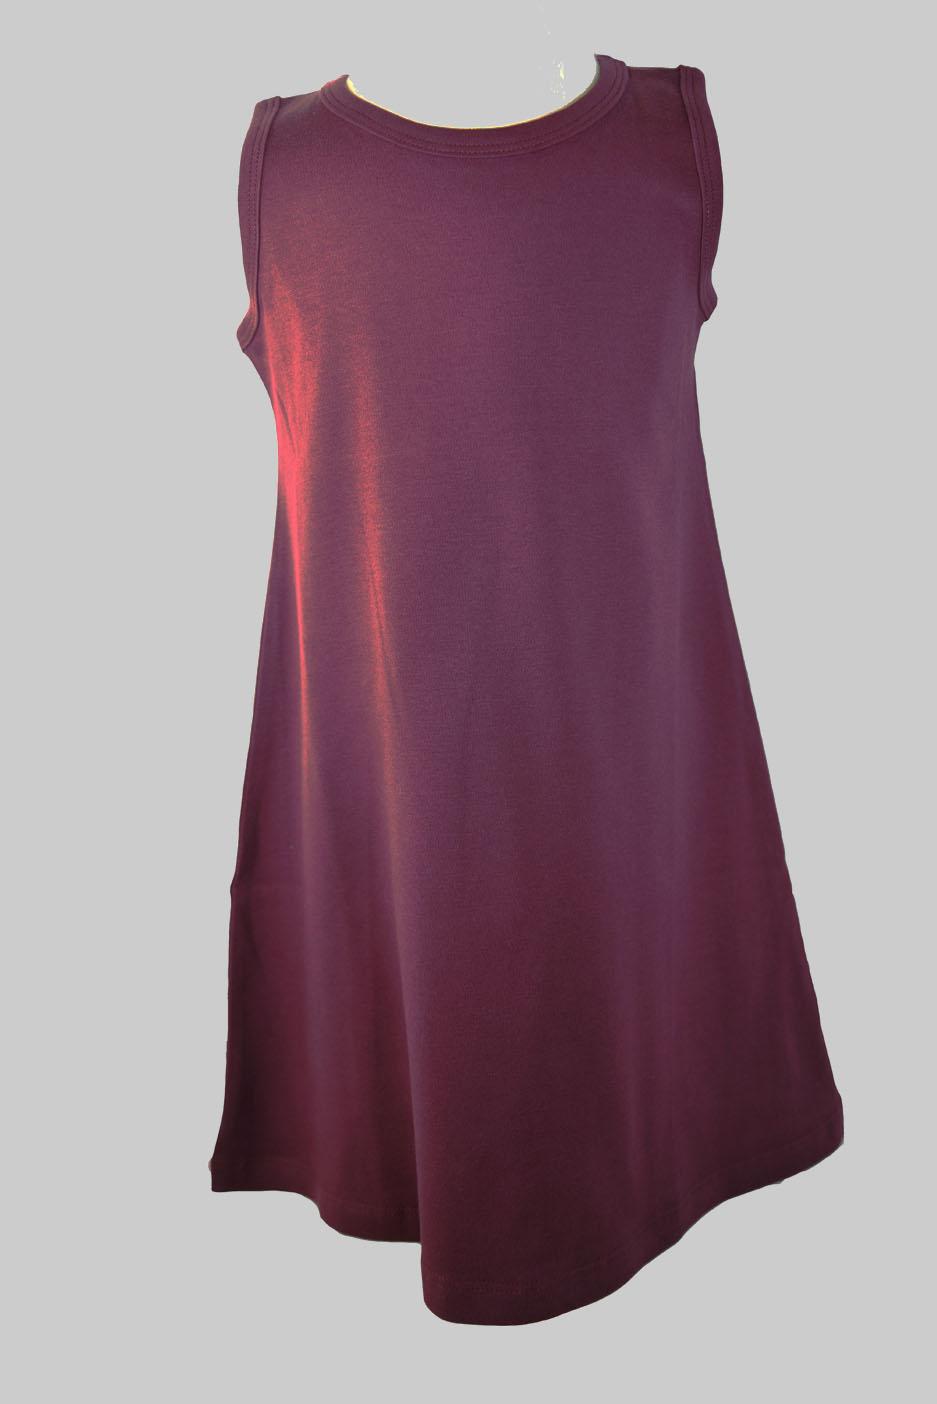 maroon color toddler girl dress